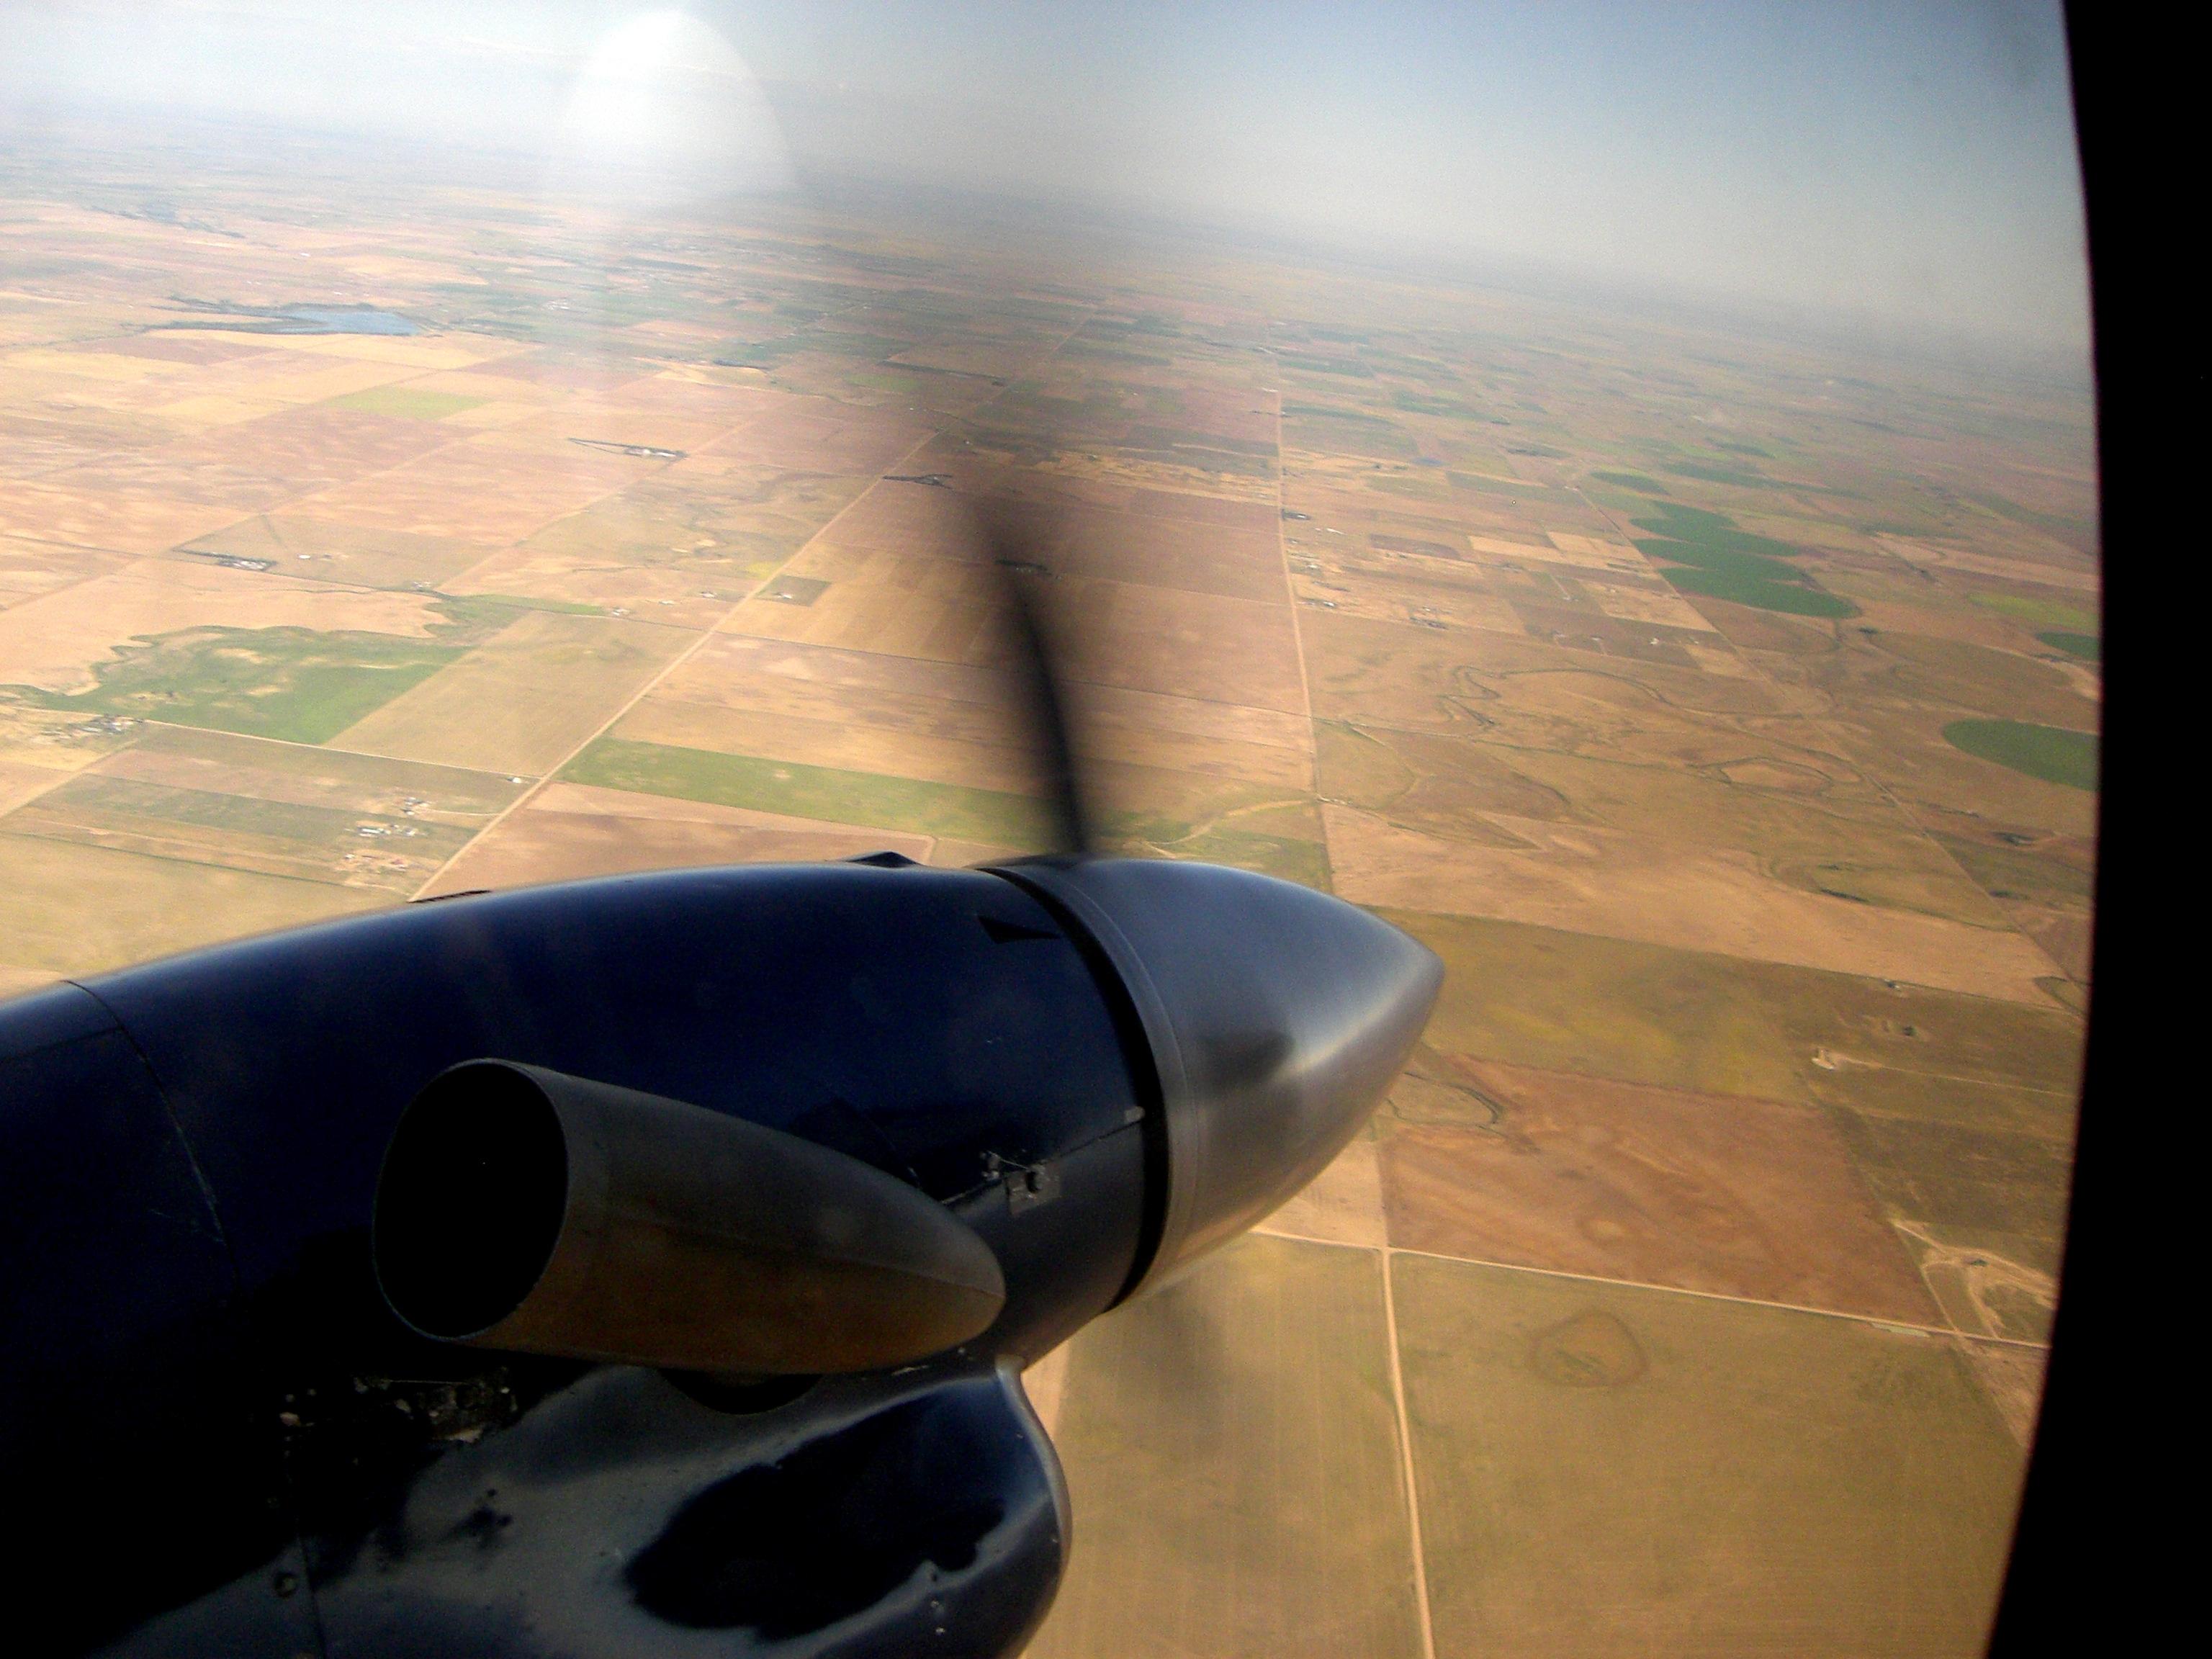 Flight photo